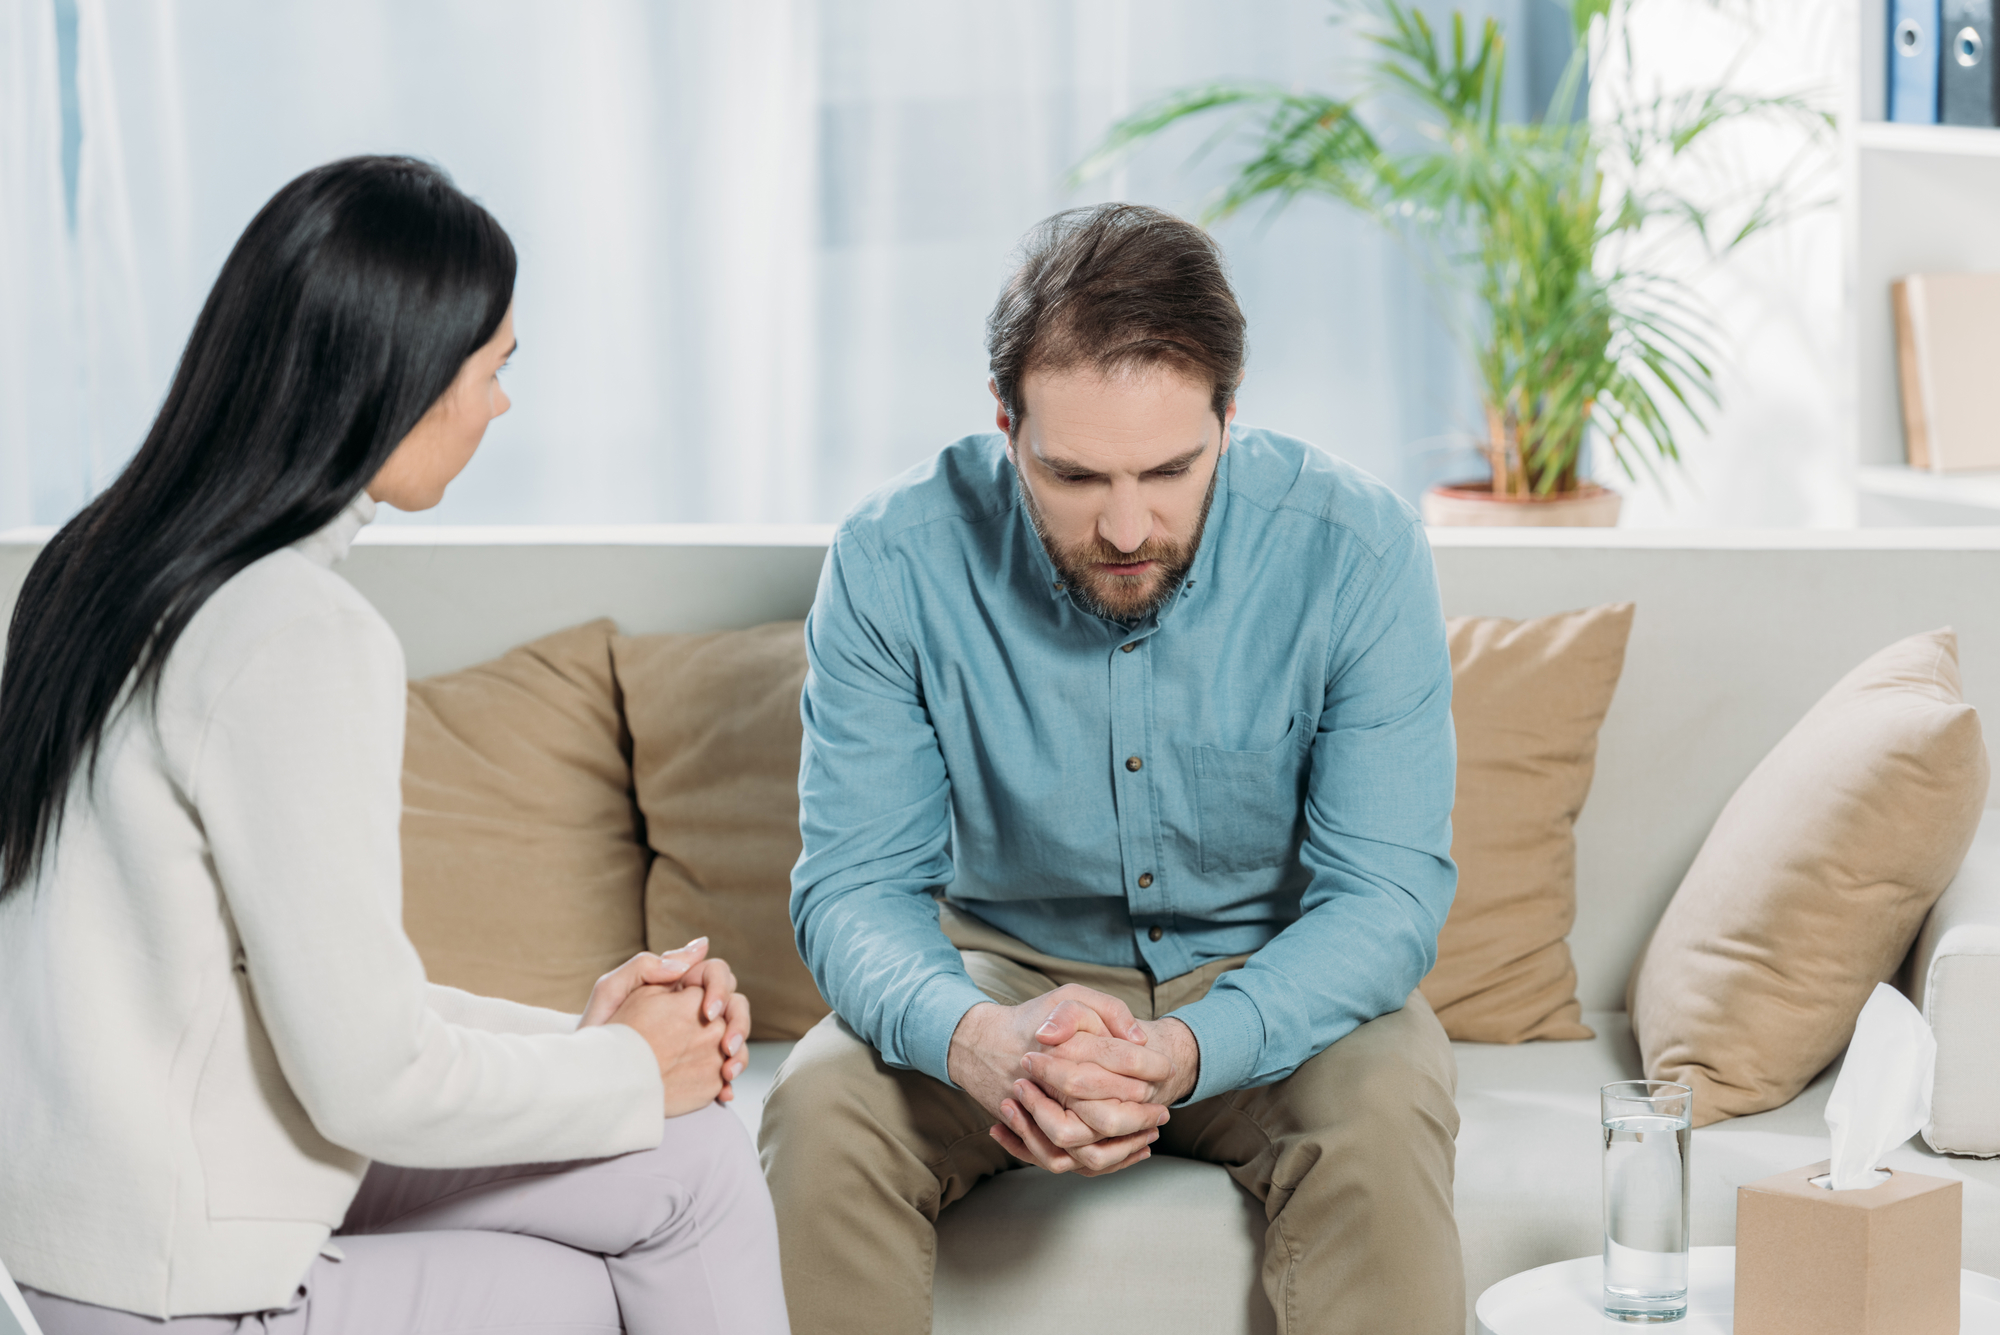 PTSD counseling